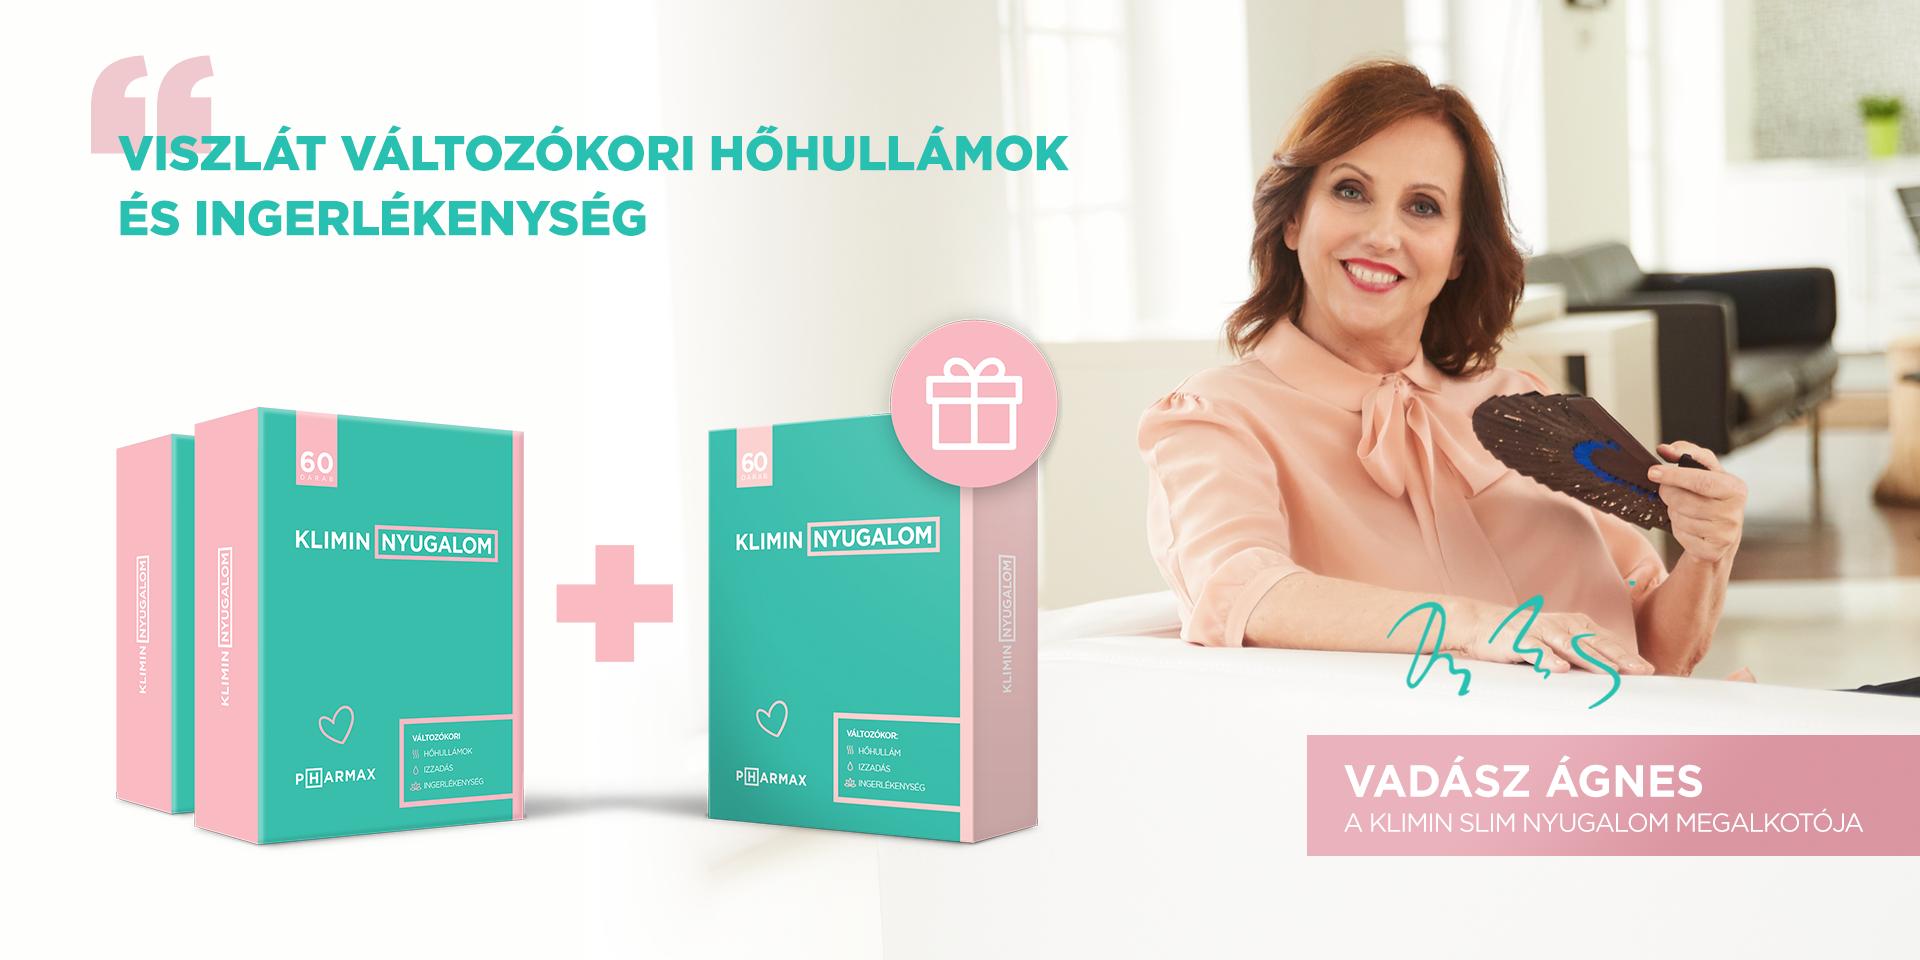 KLIMIN NYUGALOM - Pharmax